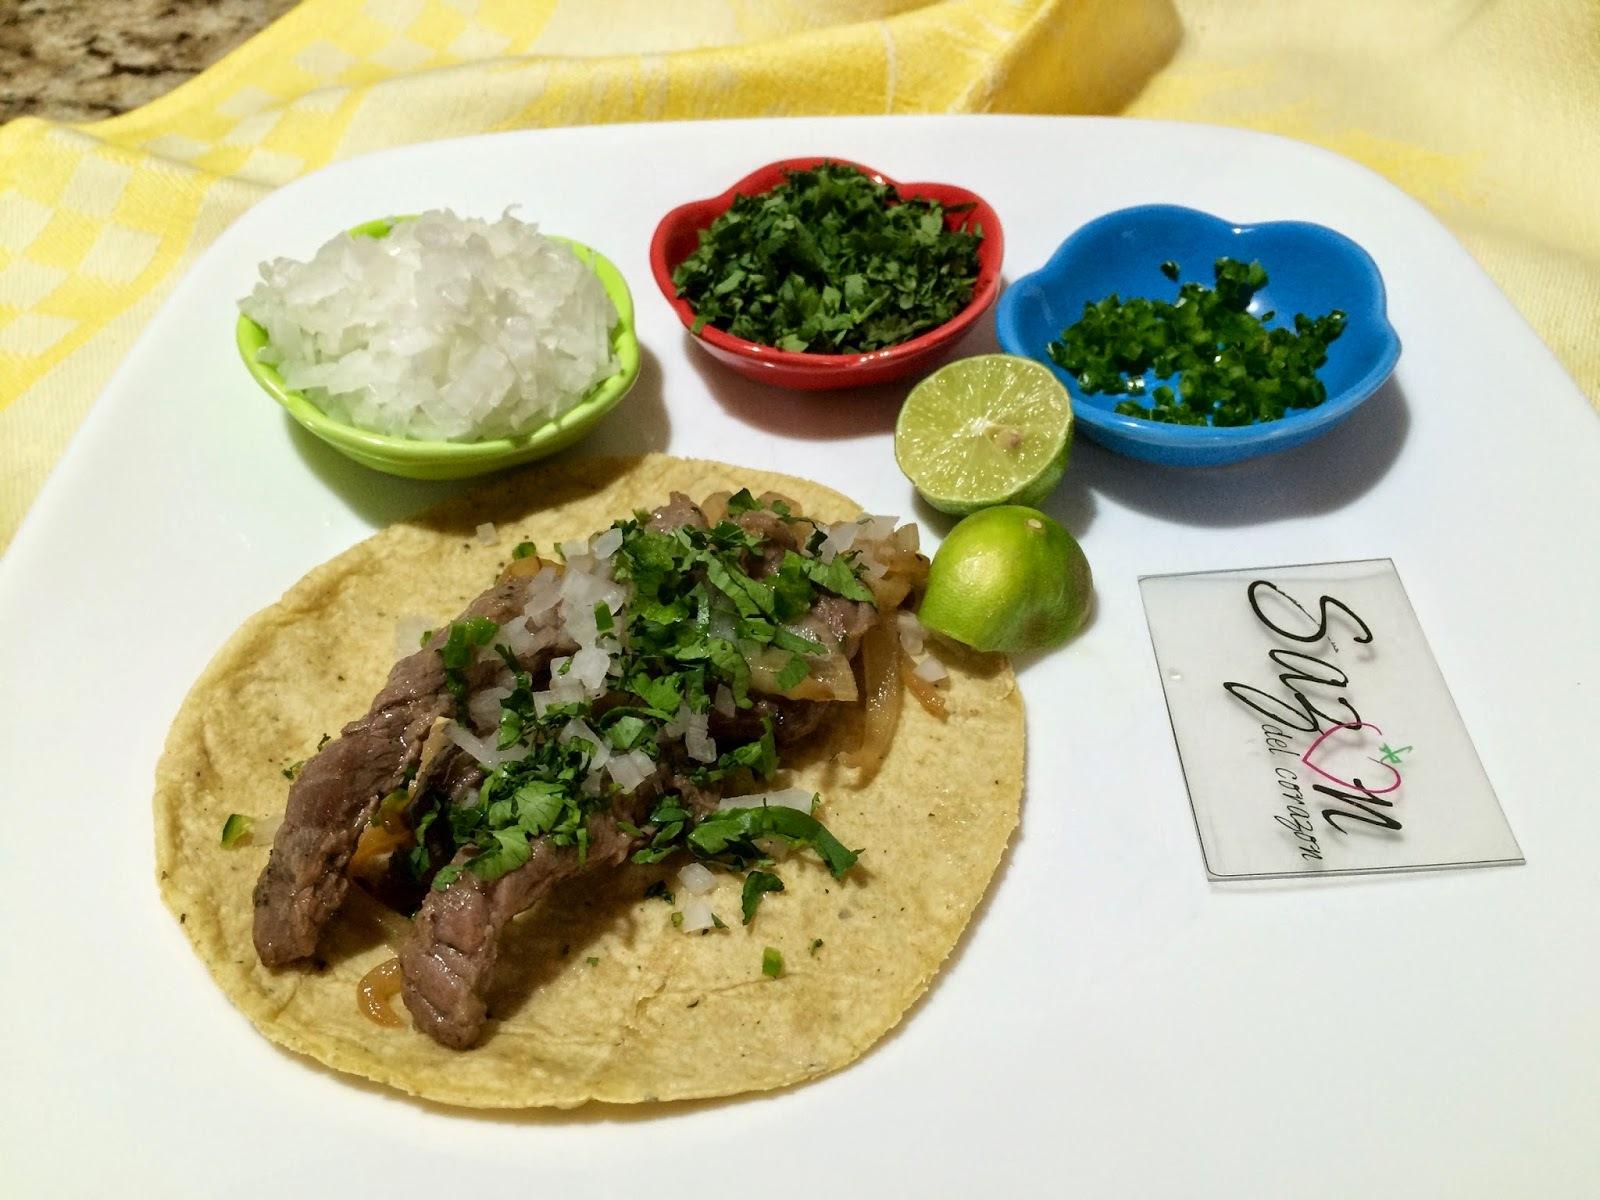 Tacos de arrachera encebollada